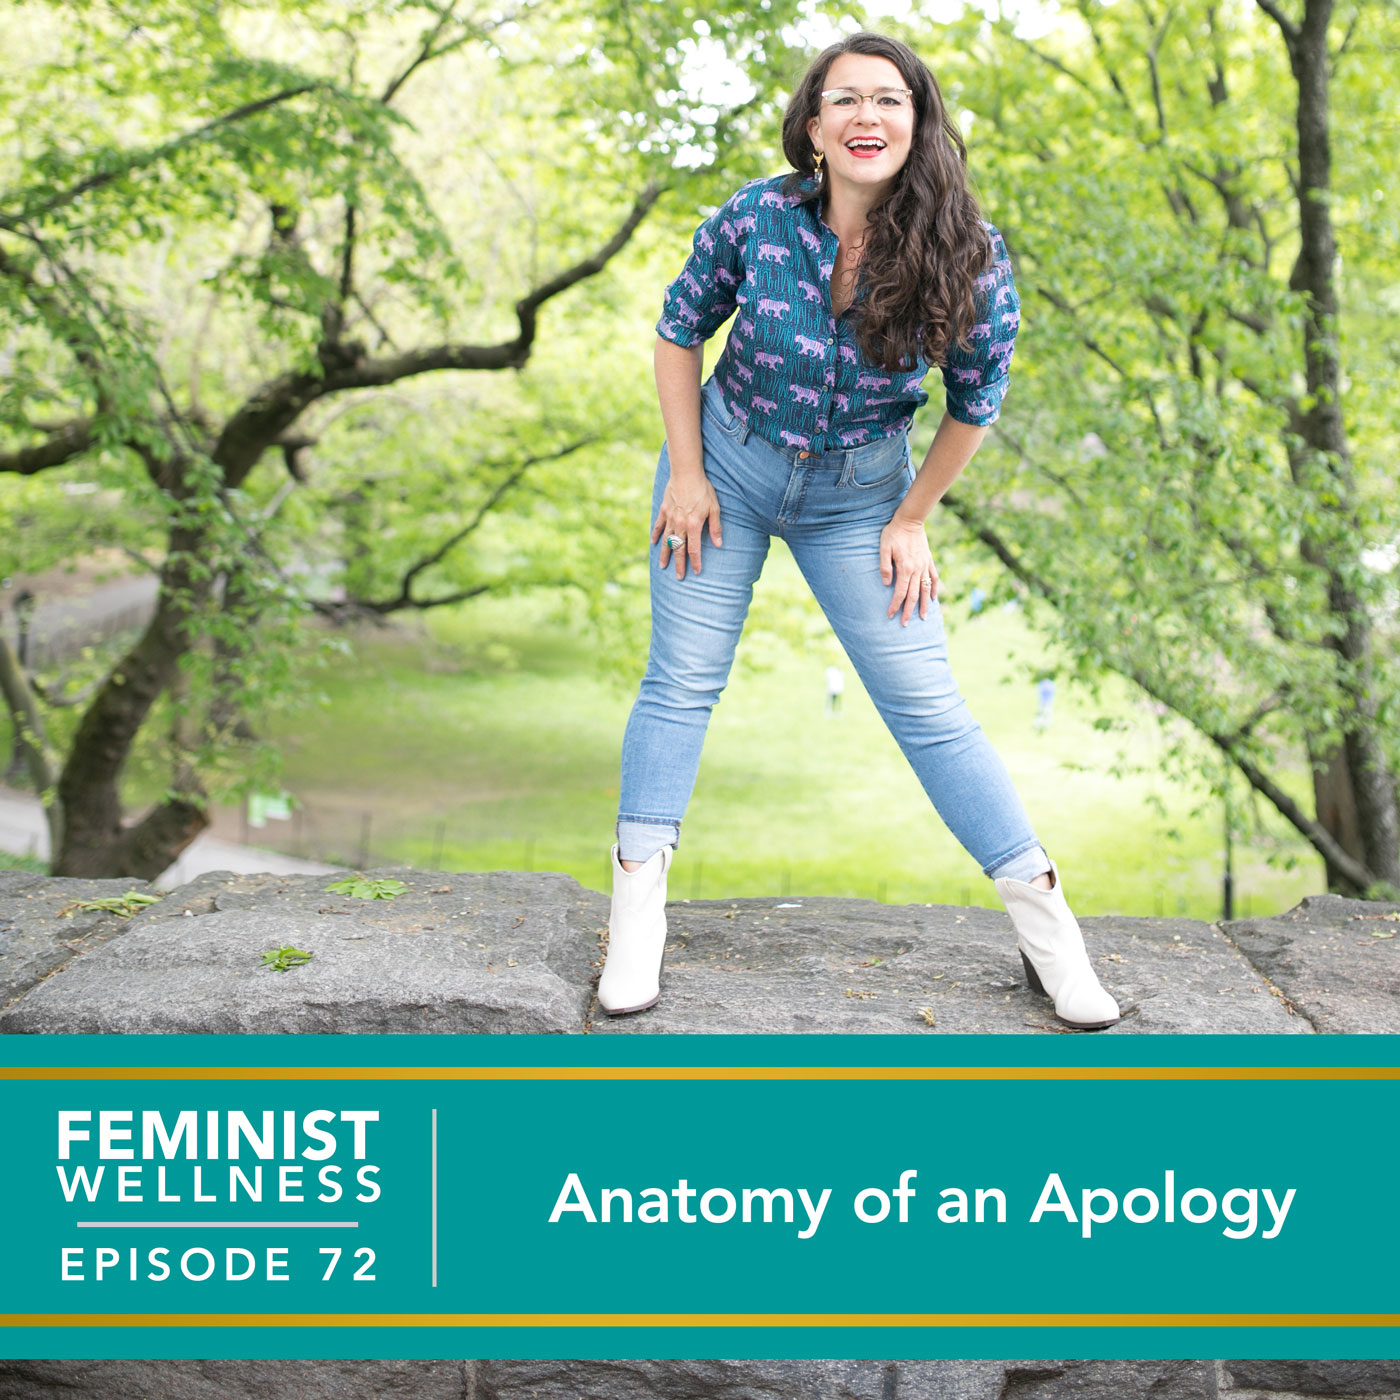 Anatomy of an Apology